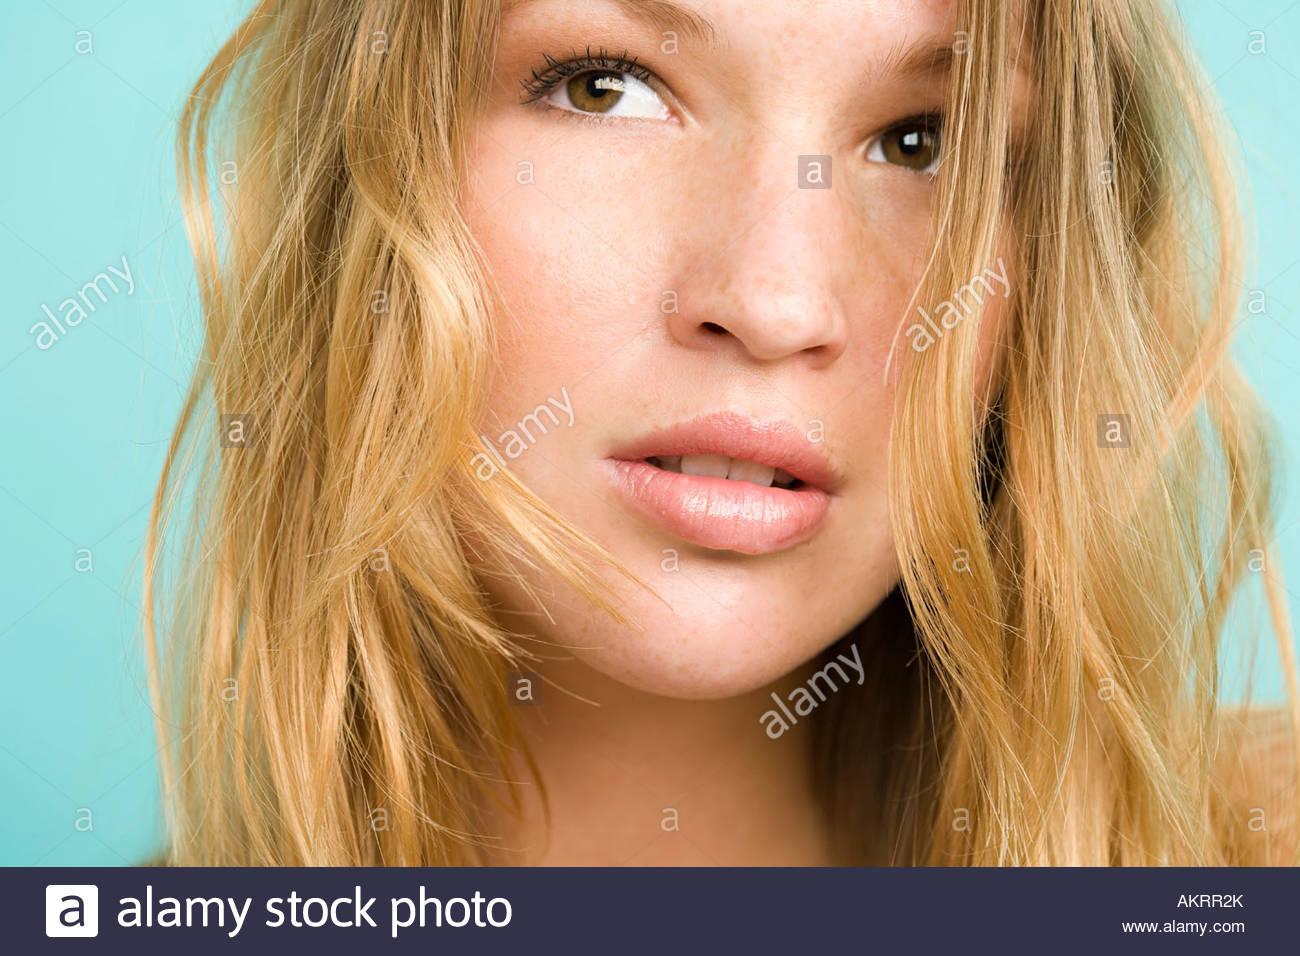 Kopfschuss einer jungen Frau Stockbild